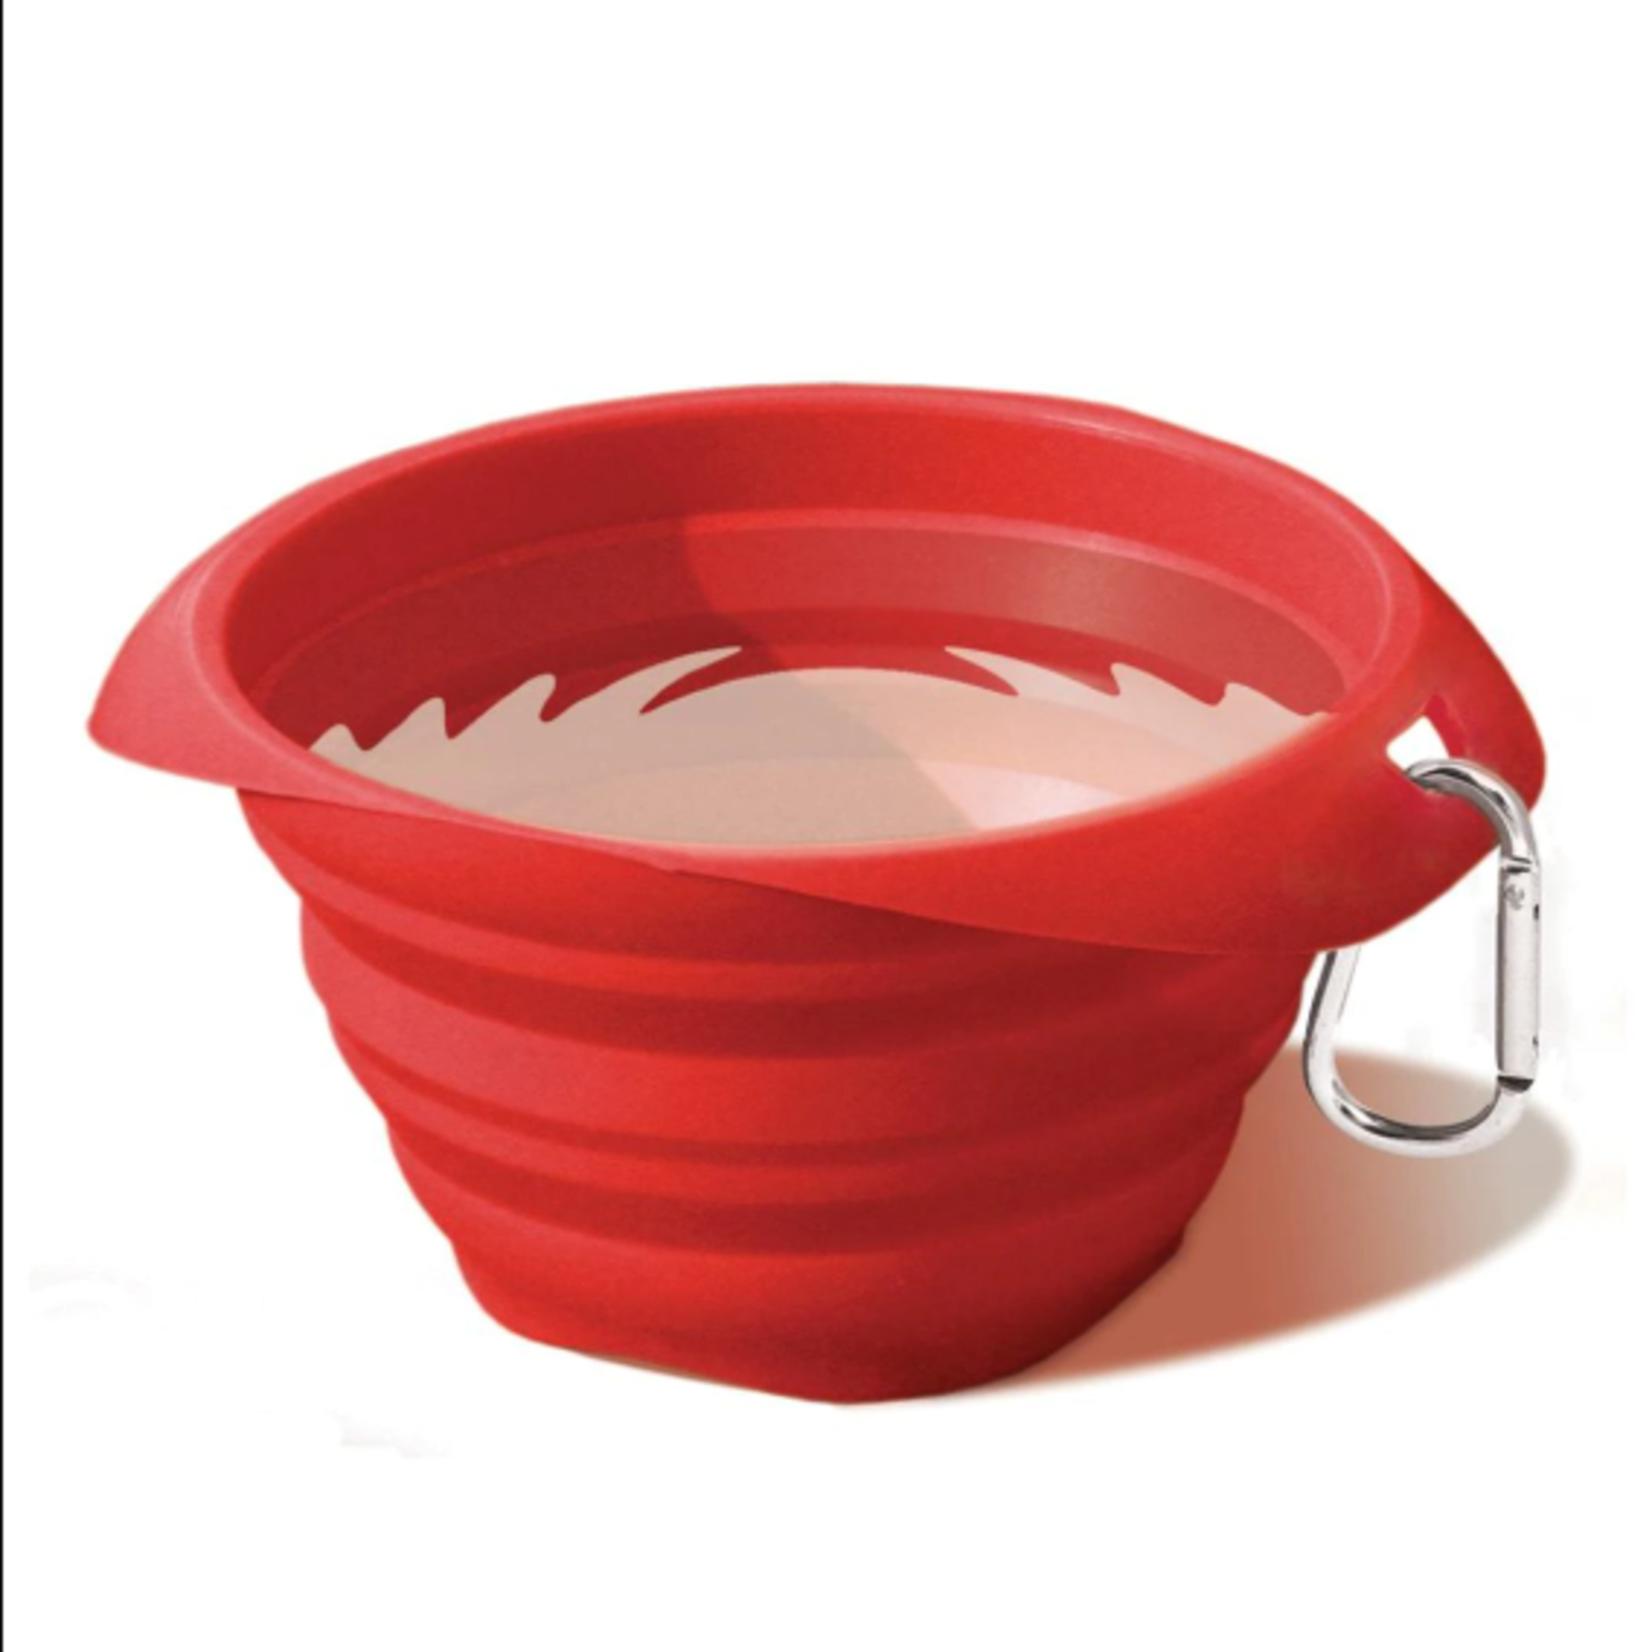 Kurgo Kurgo Collapsable Bowl Red